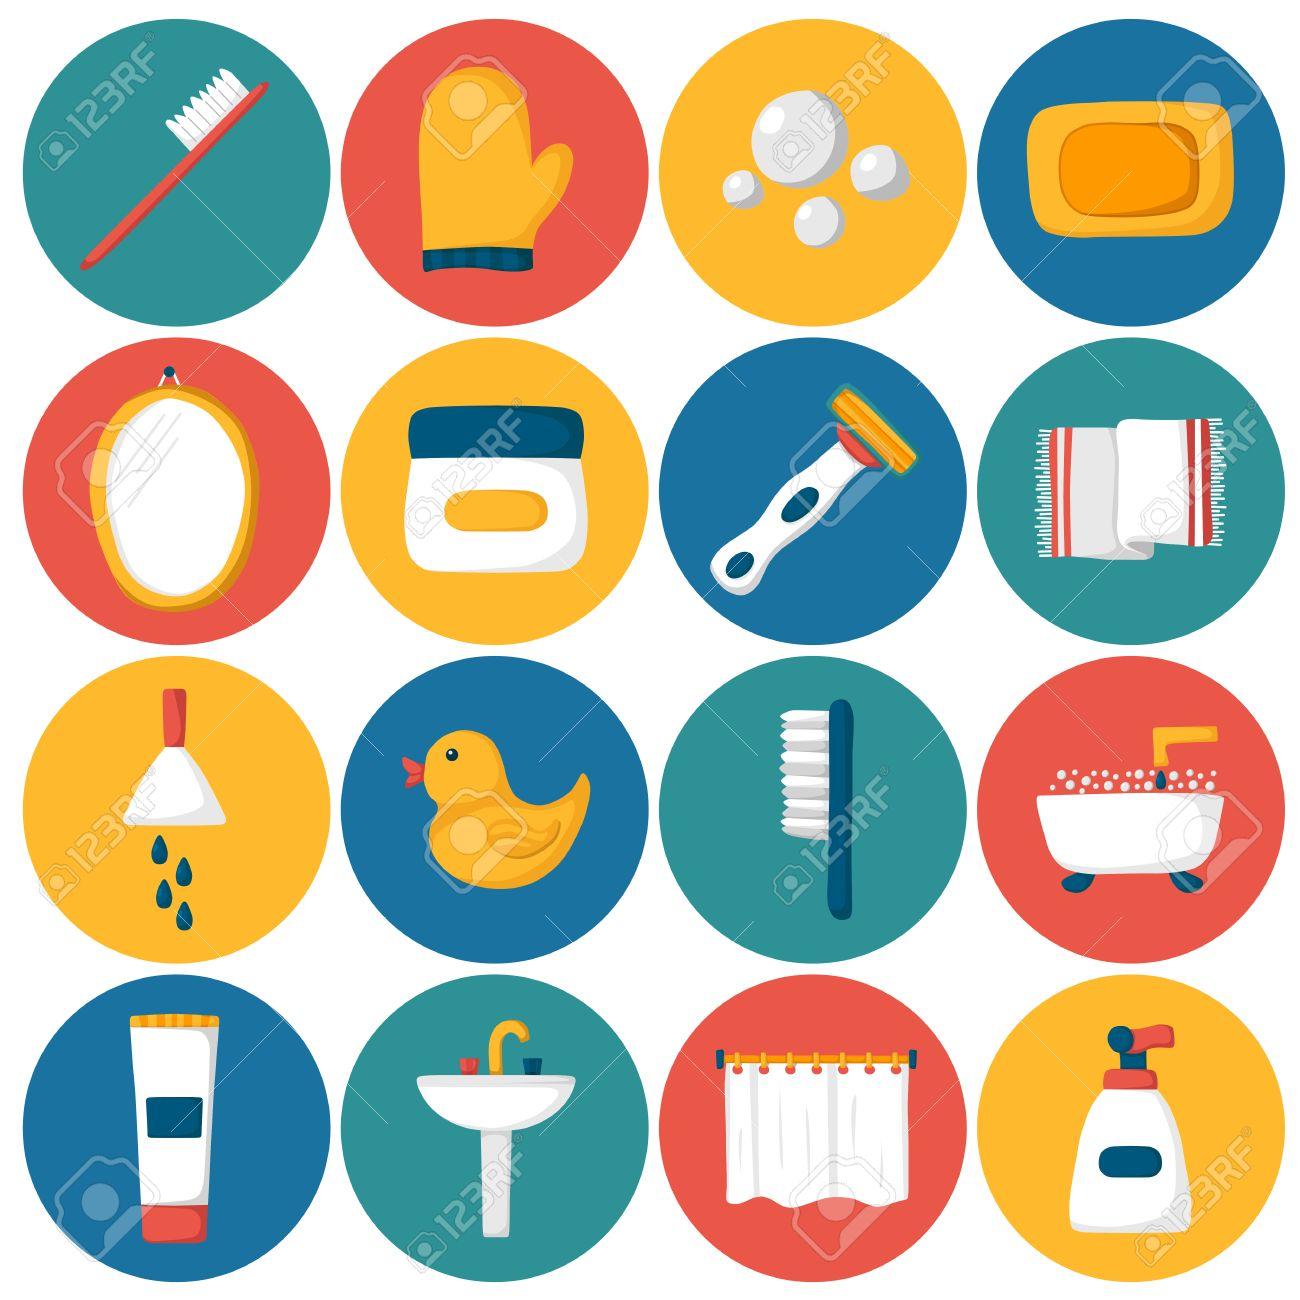 Set Of Cartoon Bathroom Icons: Bath, Duck, Toothbrush, Towel ... for Bathroom Sink Toothbrush Clipart  56mzq